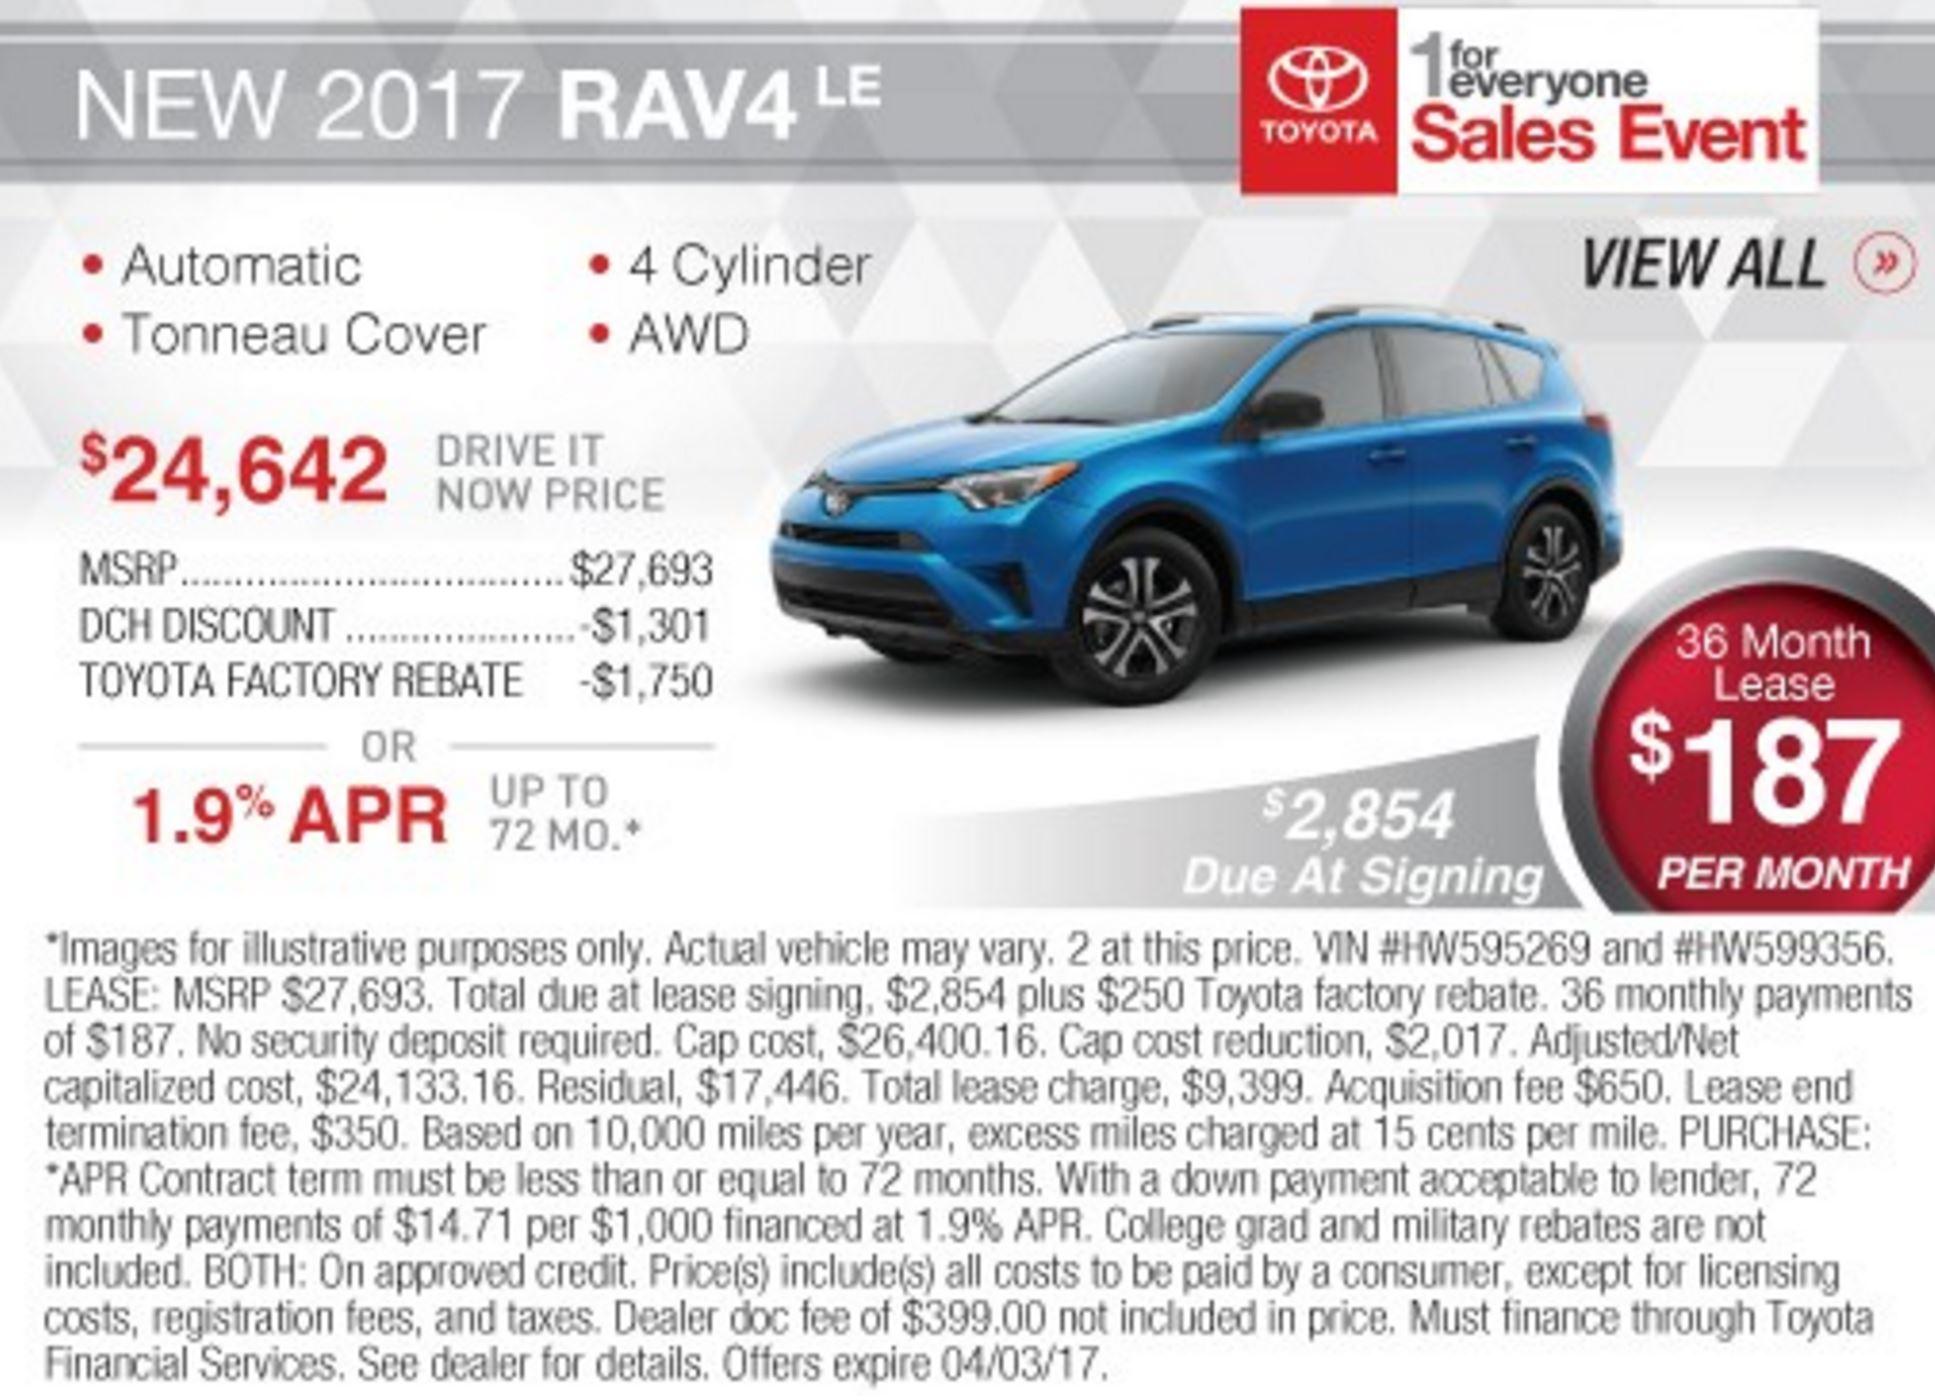 Dch Brunswick Toyota | Upcomingcarshq.com